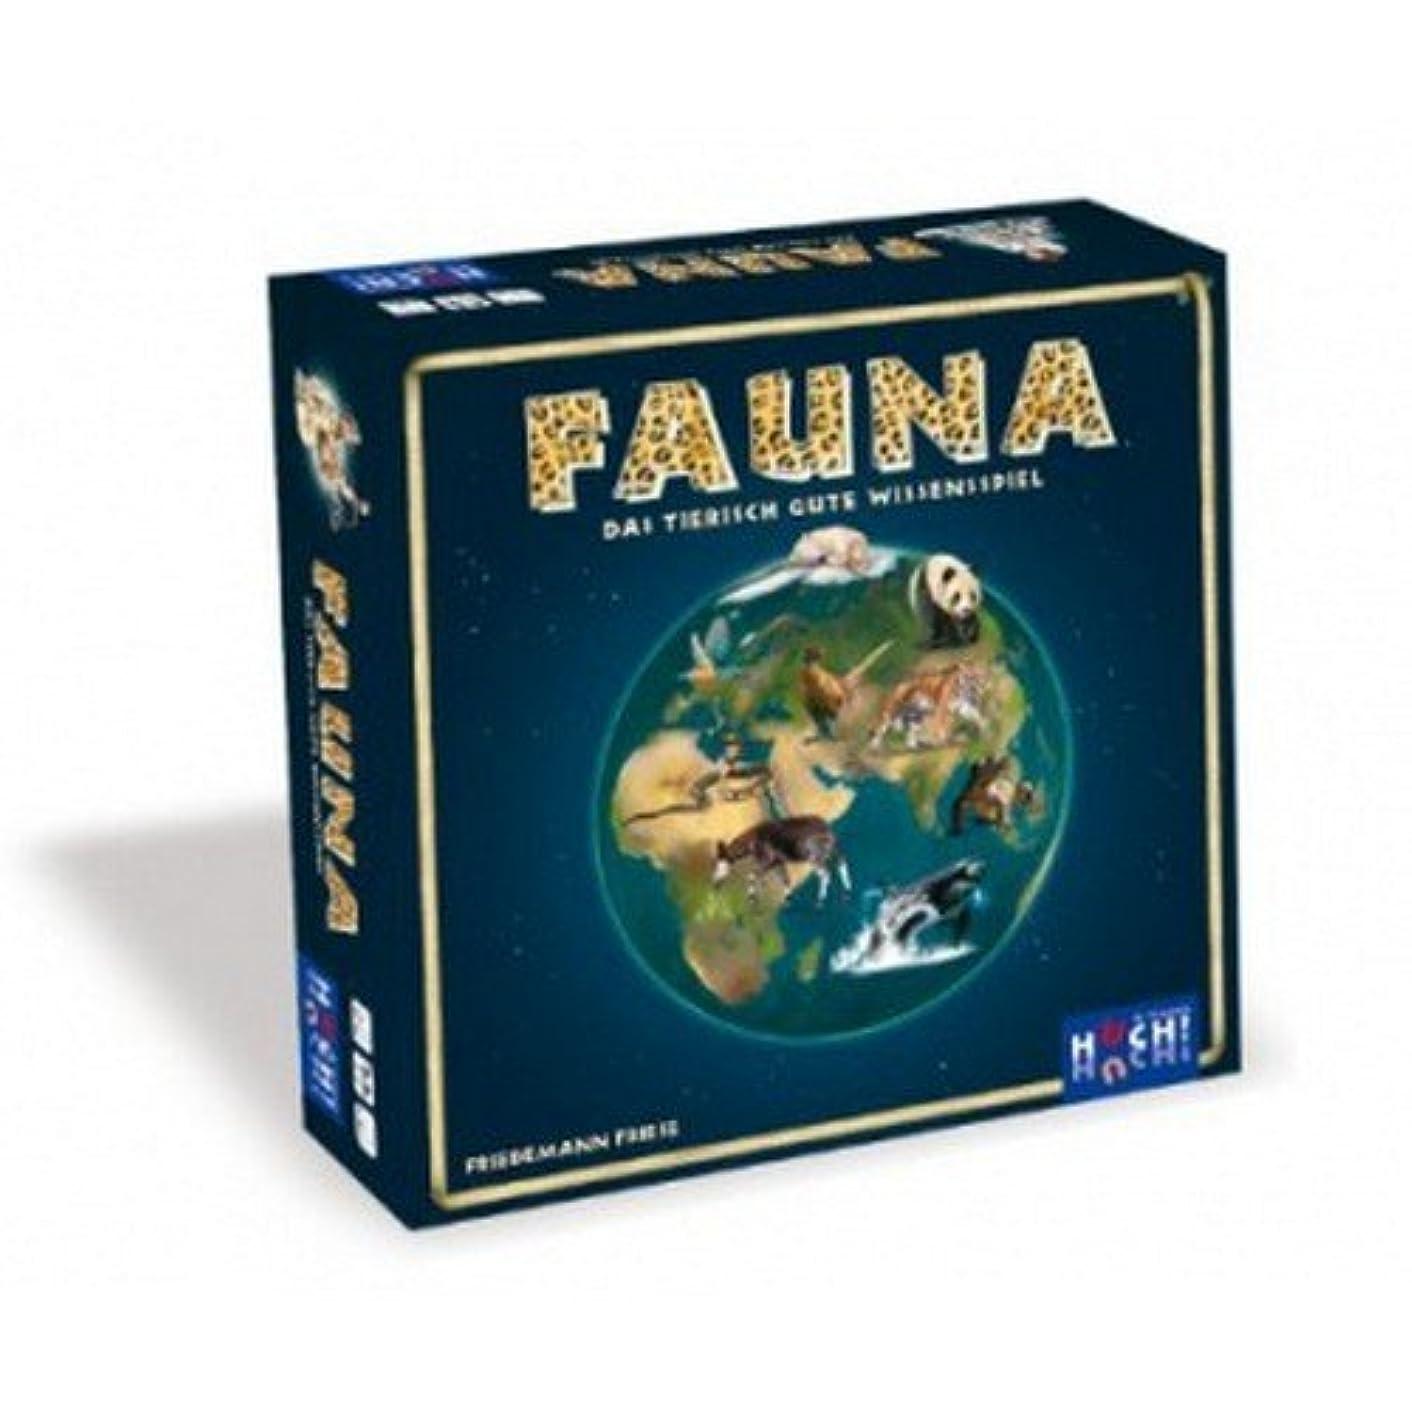 Huch & Friends 75808聽Fauna: Fauna聽-聽Tierisch Gute Knowledge Game